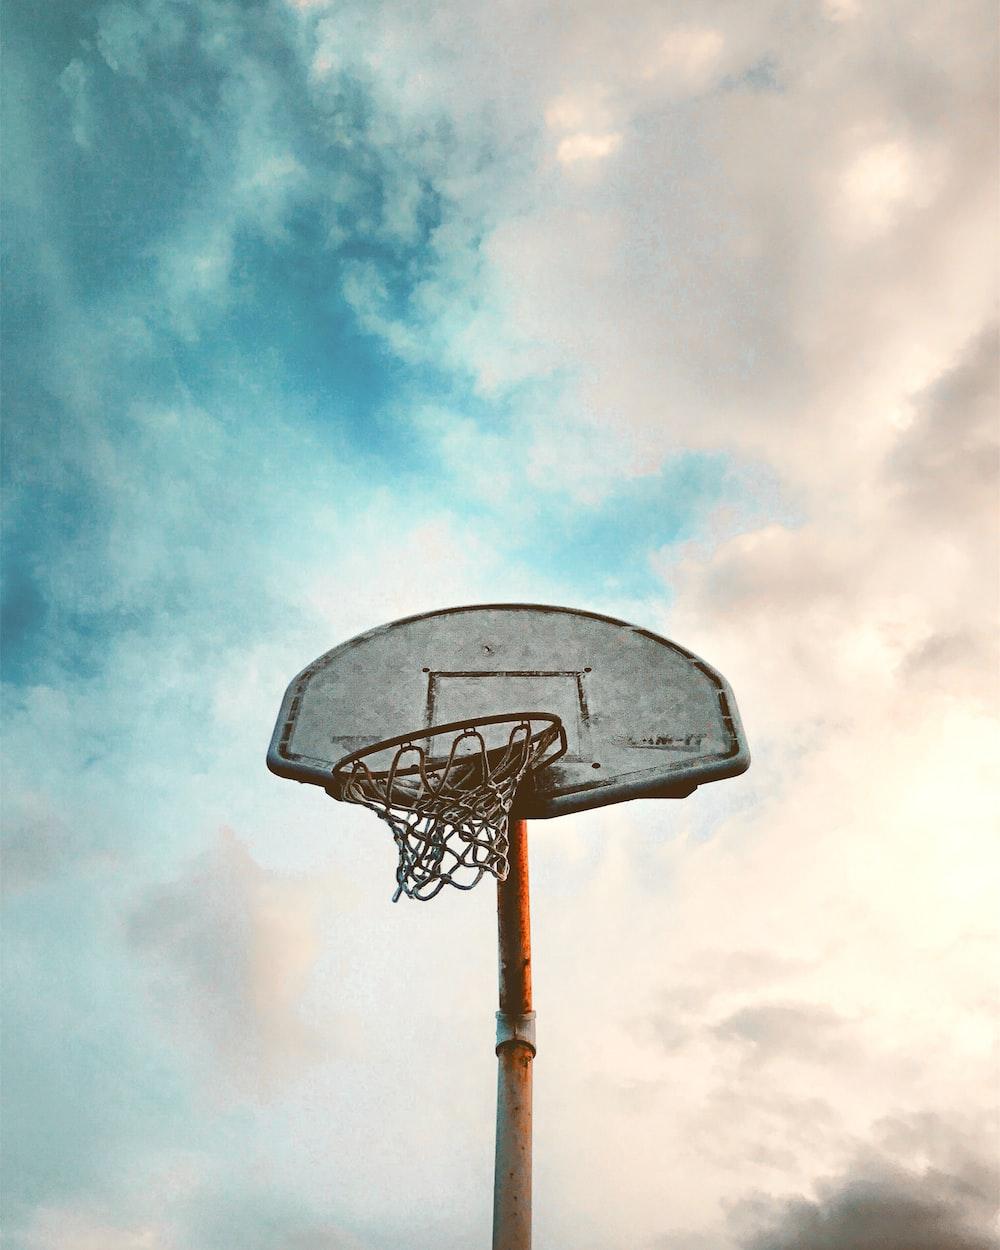 worm's-eye view of basketball board